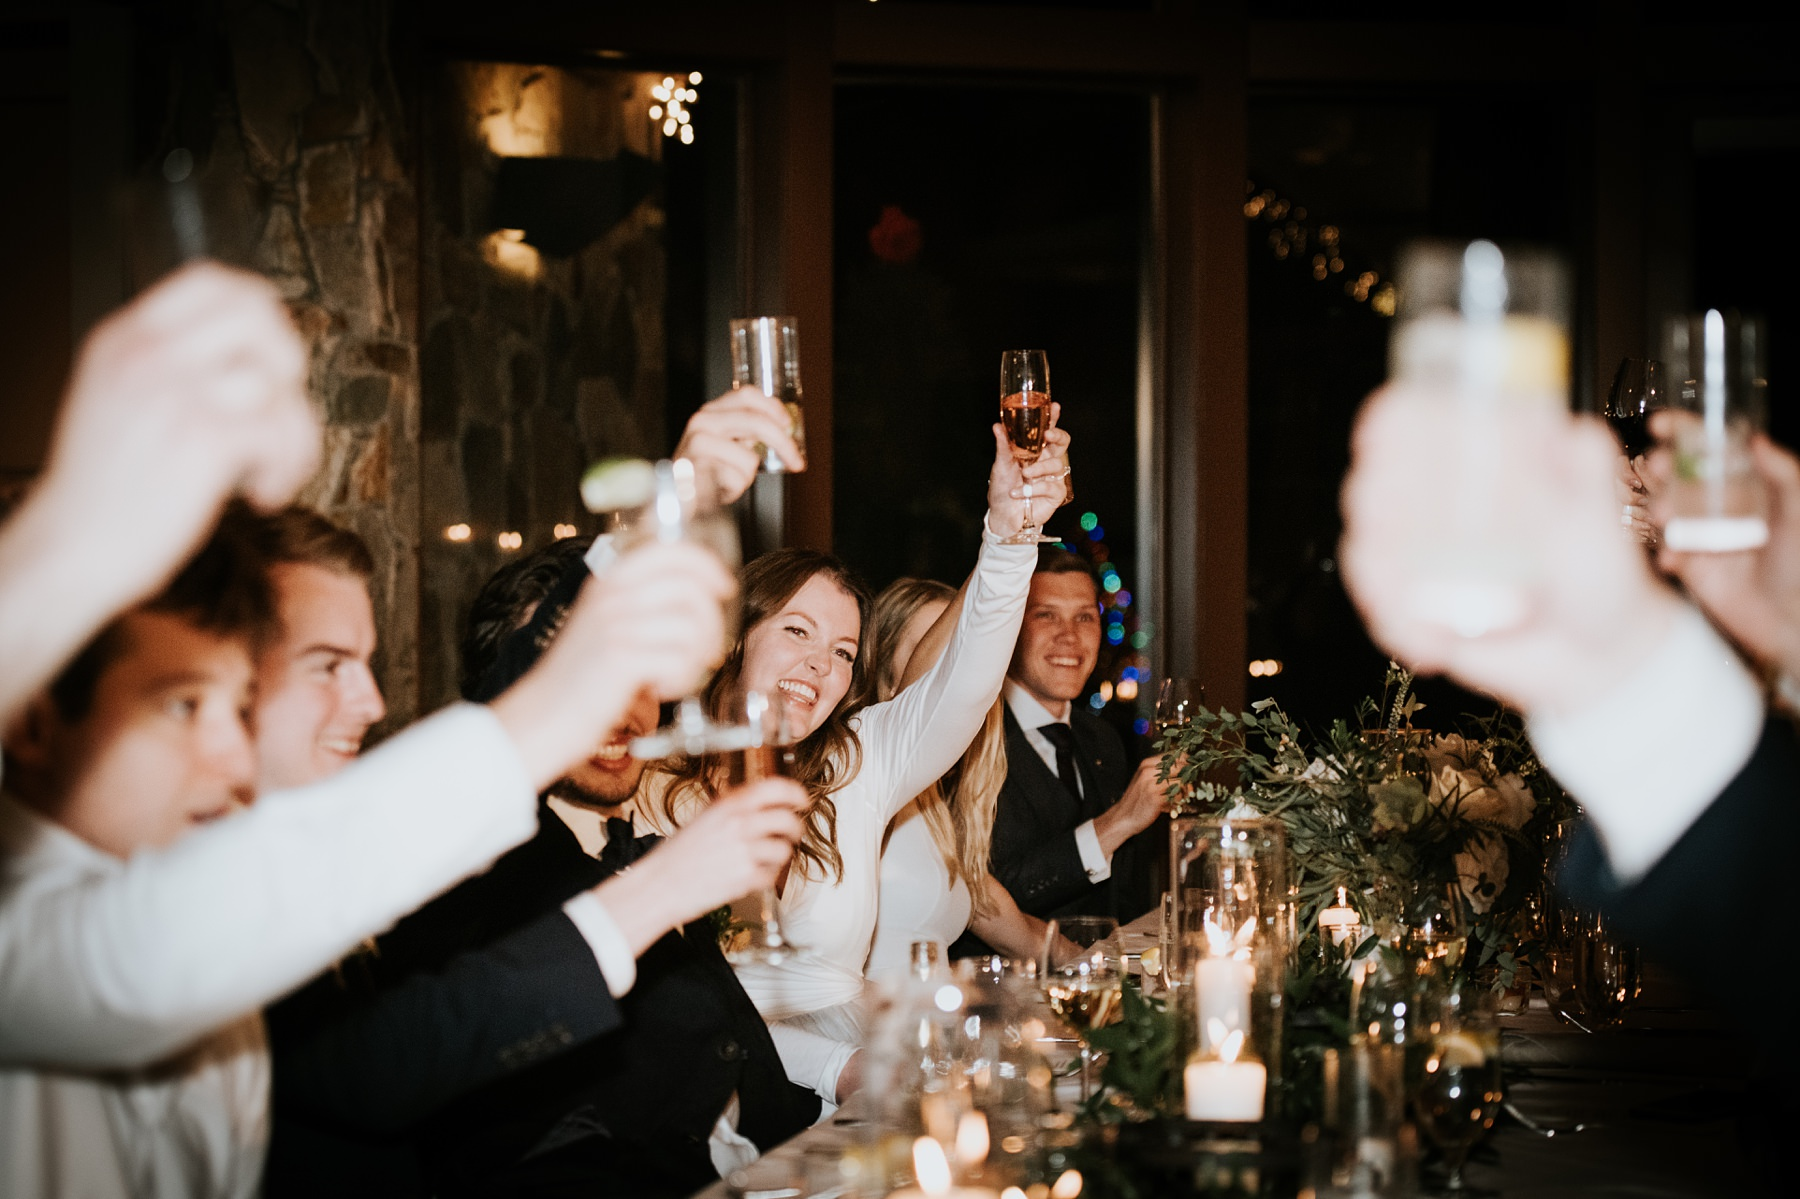 wedding toasts at winter wedding at Nita lake lodge